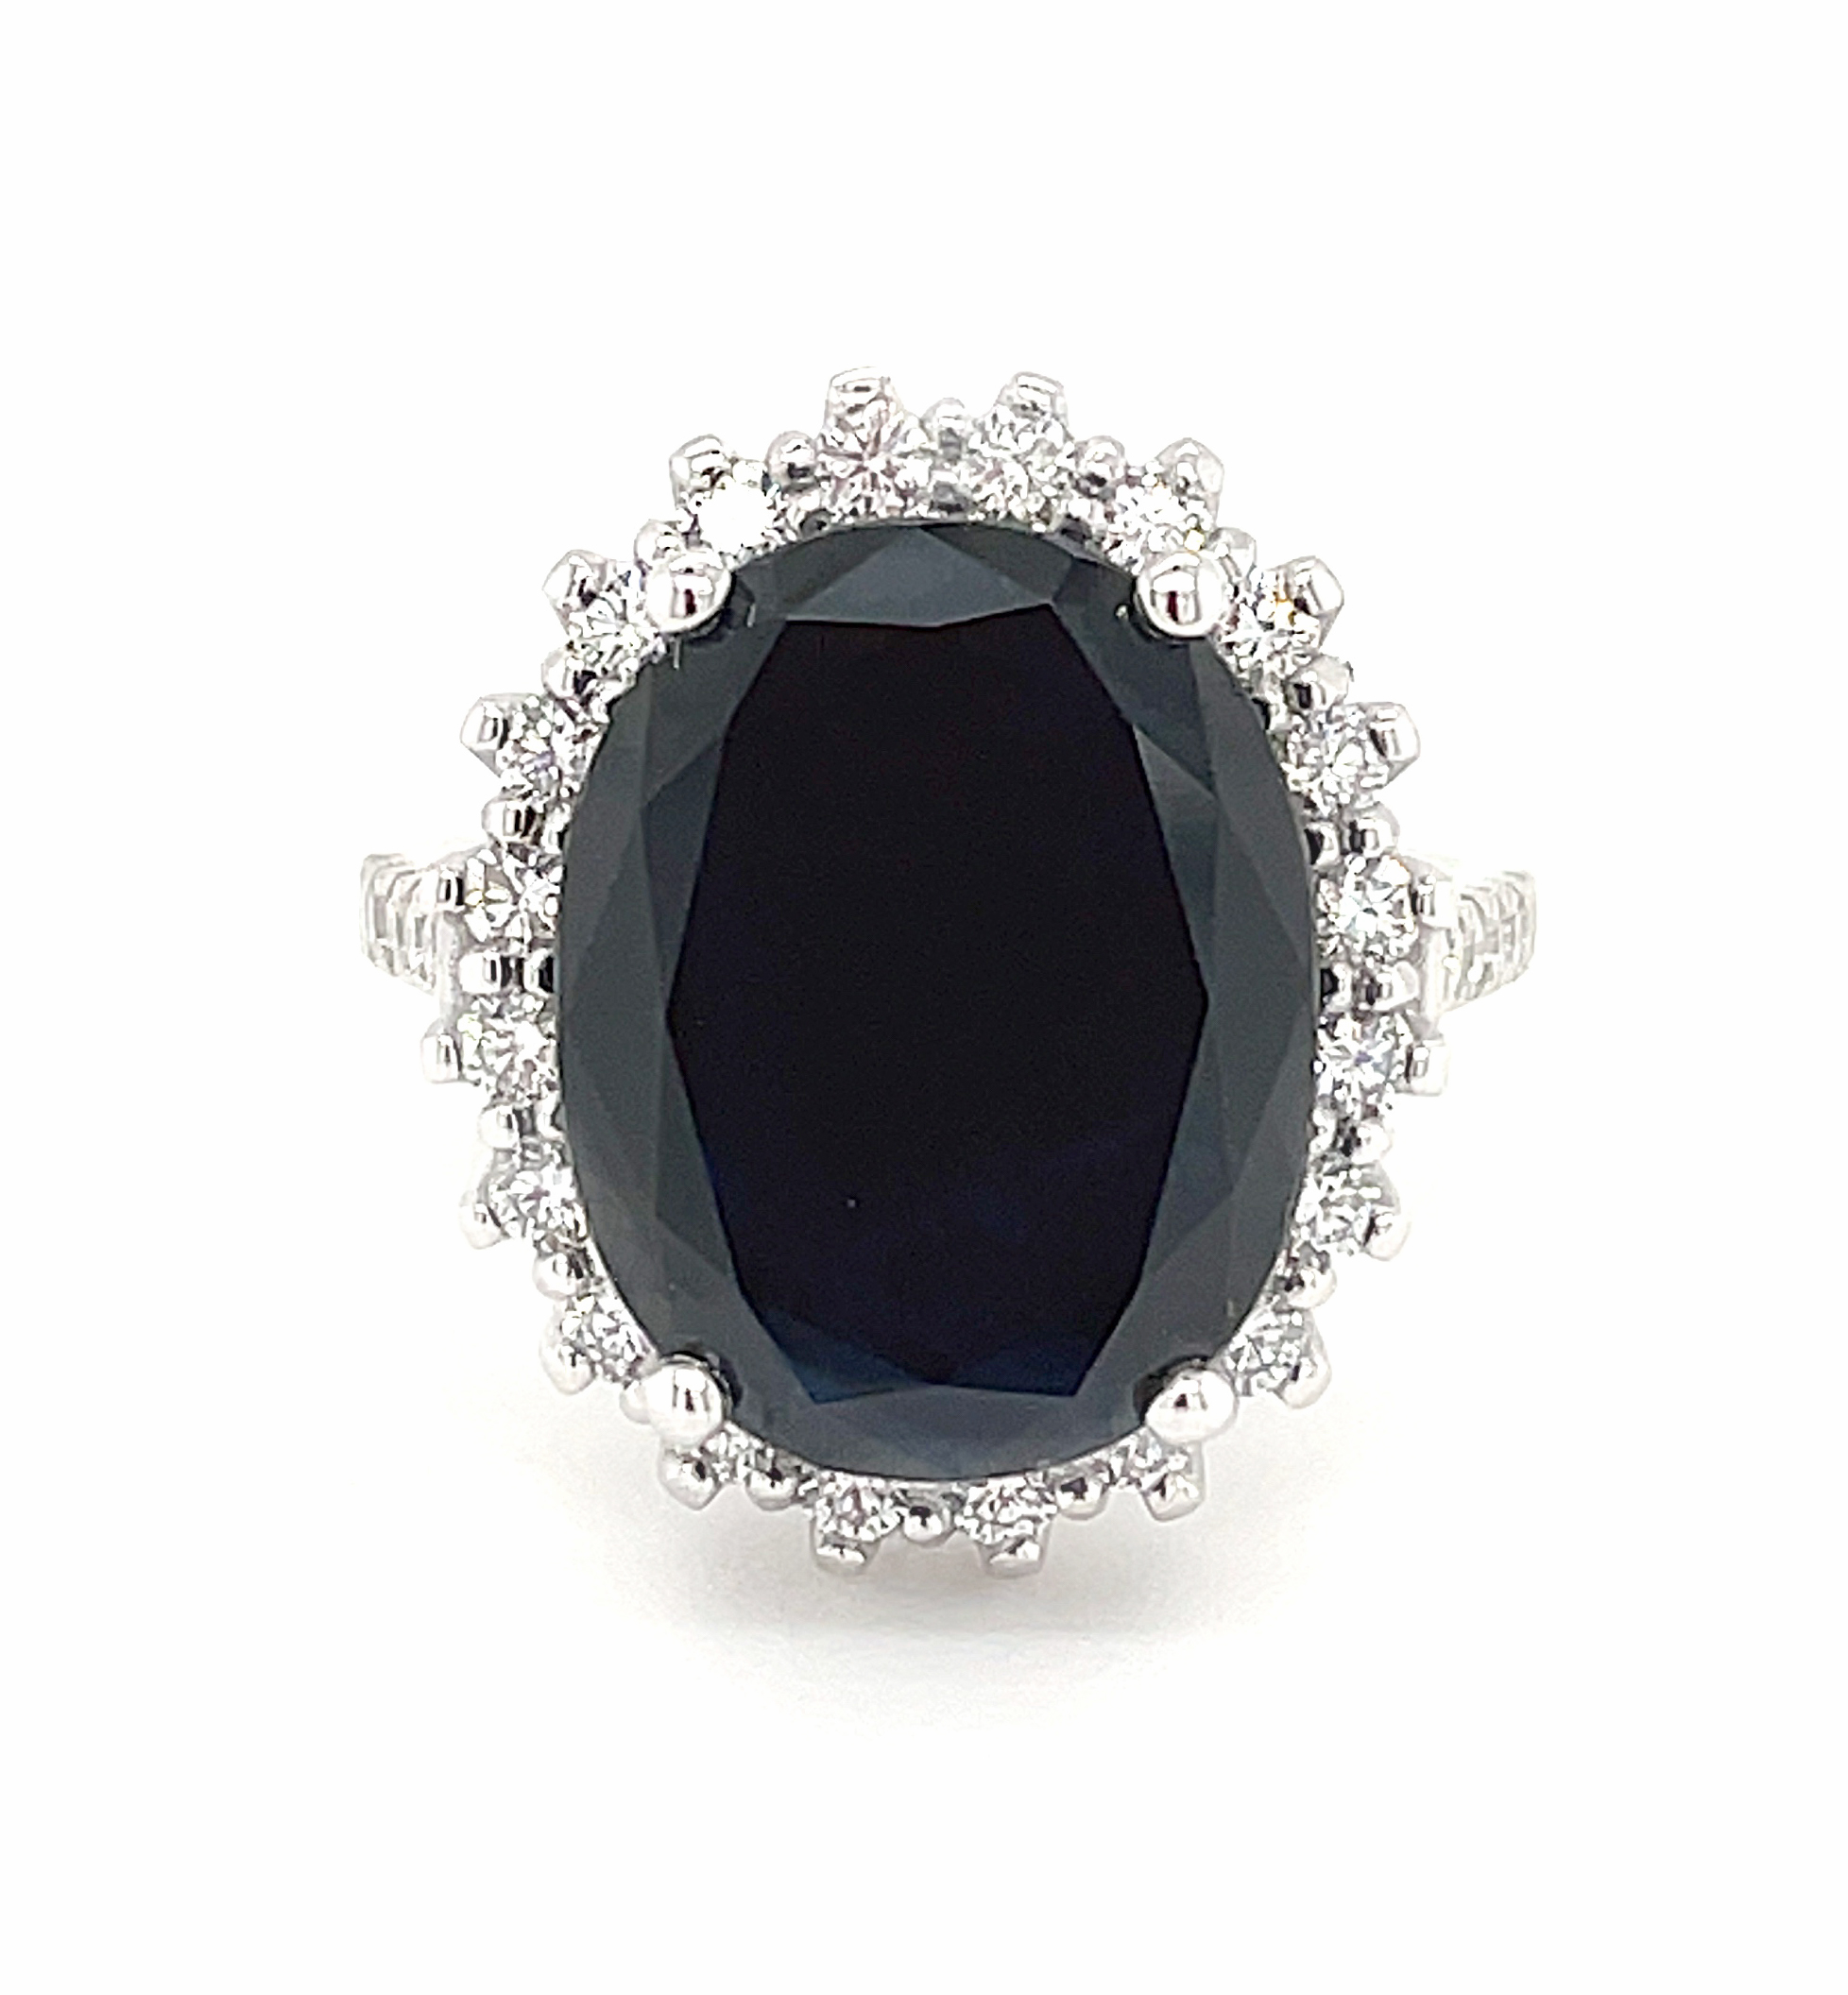 18k White Gold Dark Oval Sapphire & Brilliant Cut Diamond Cluster Ring